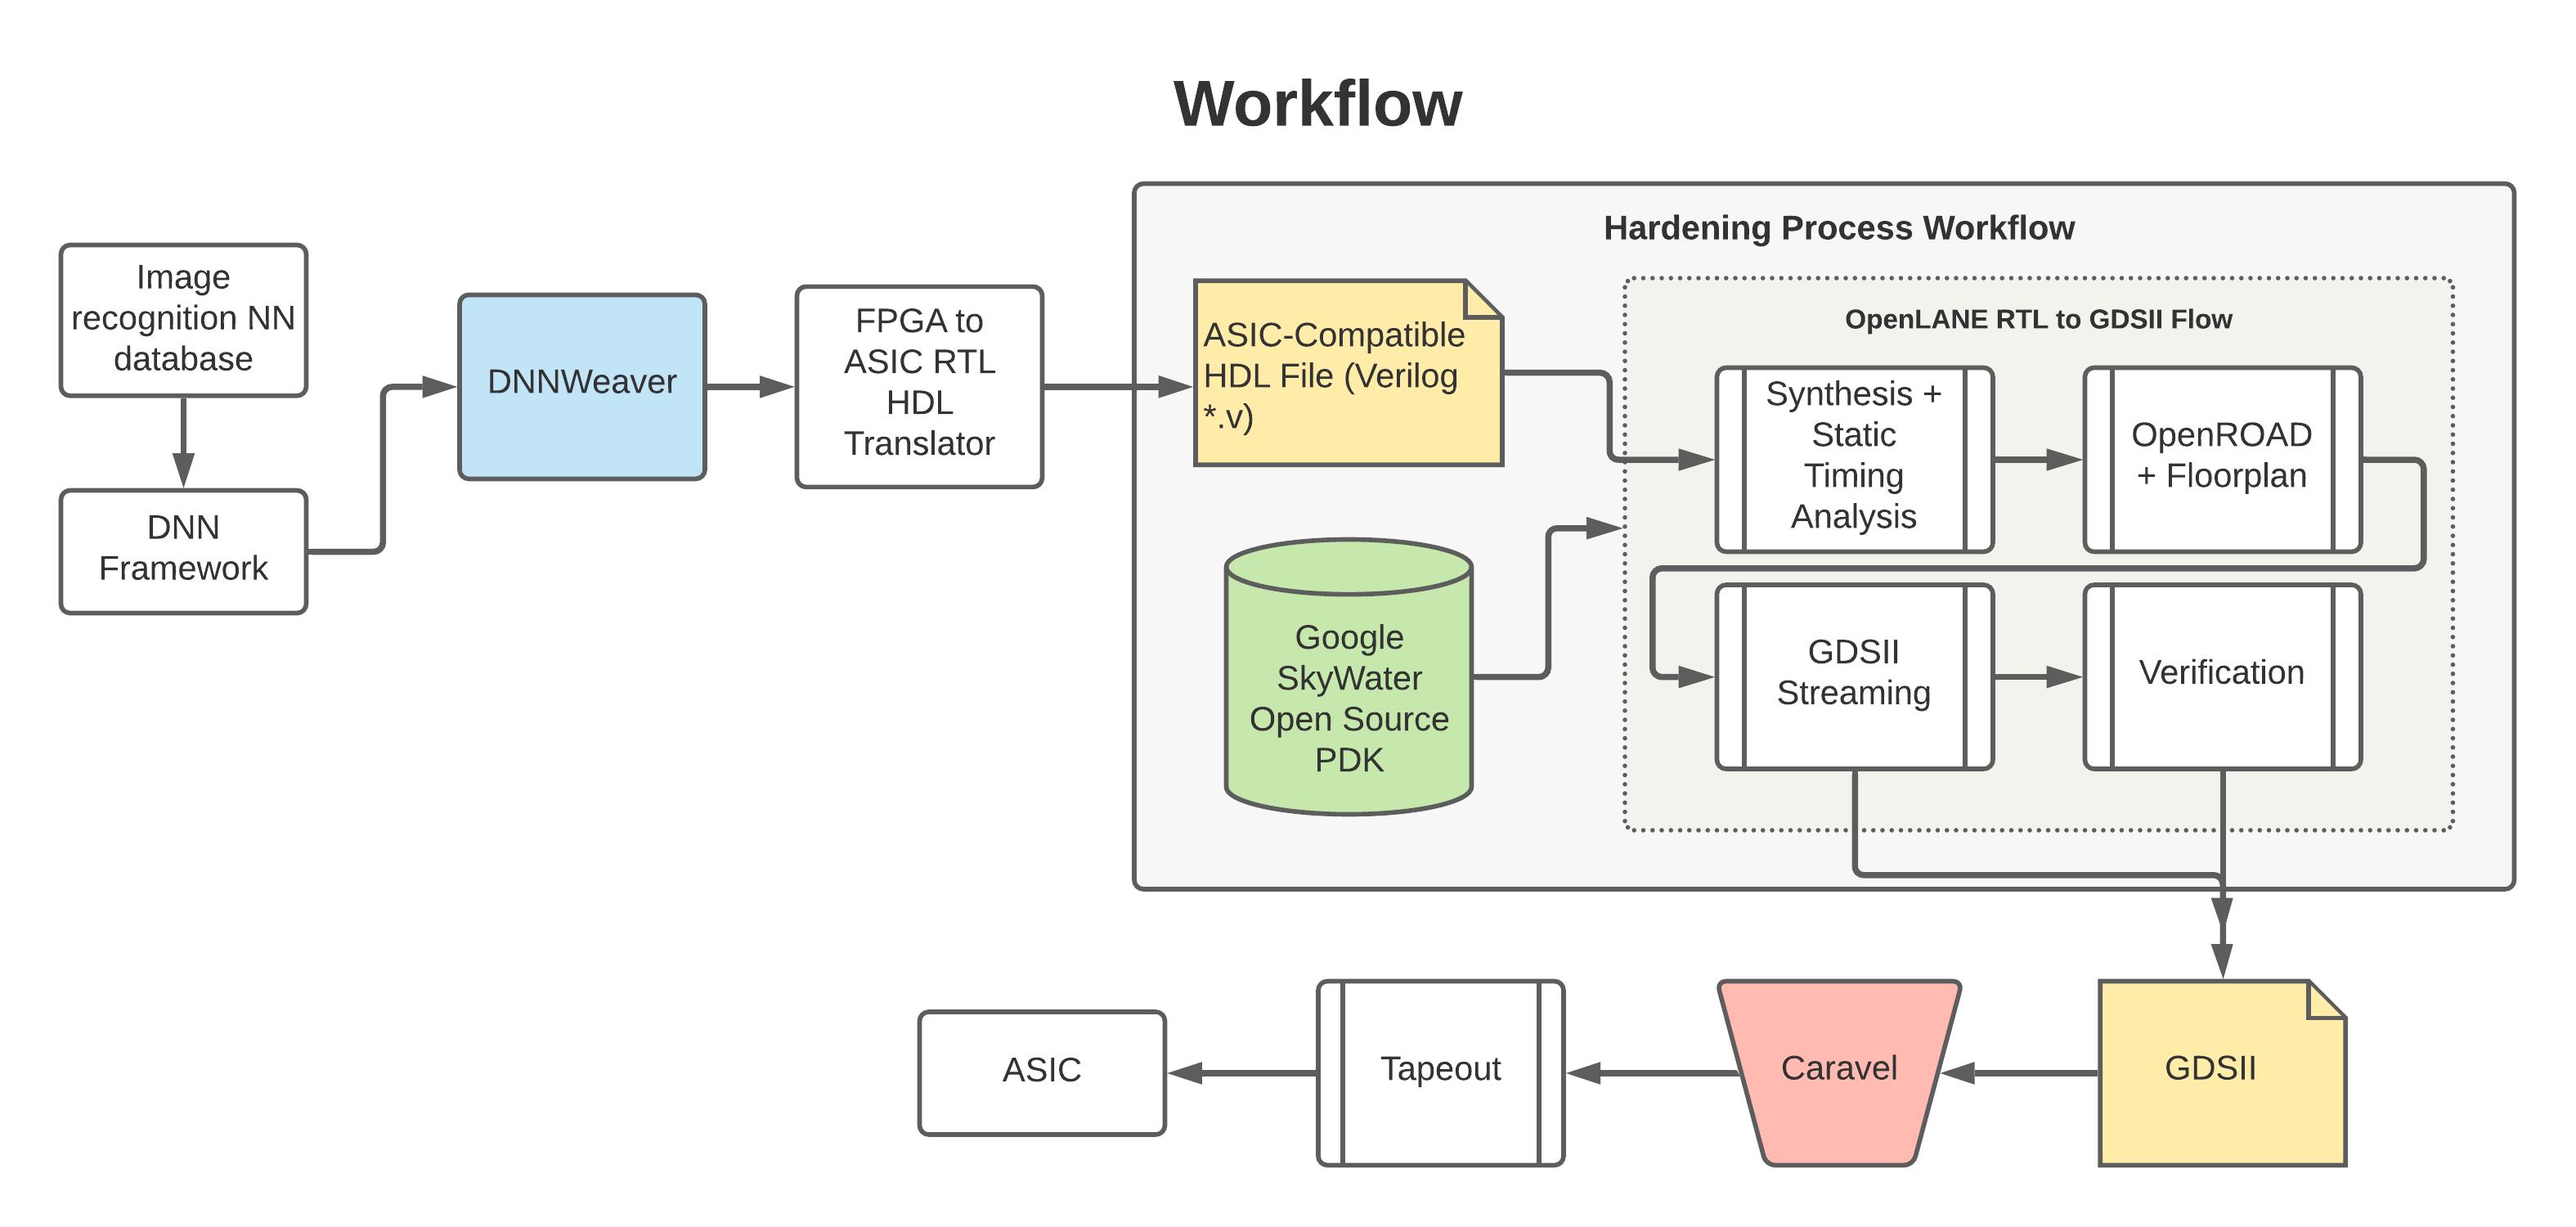 Hardening process